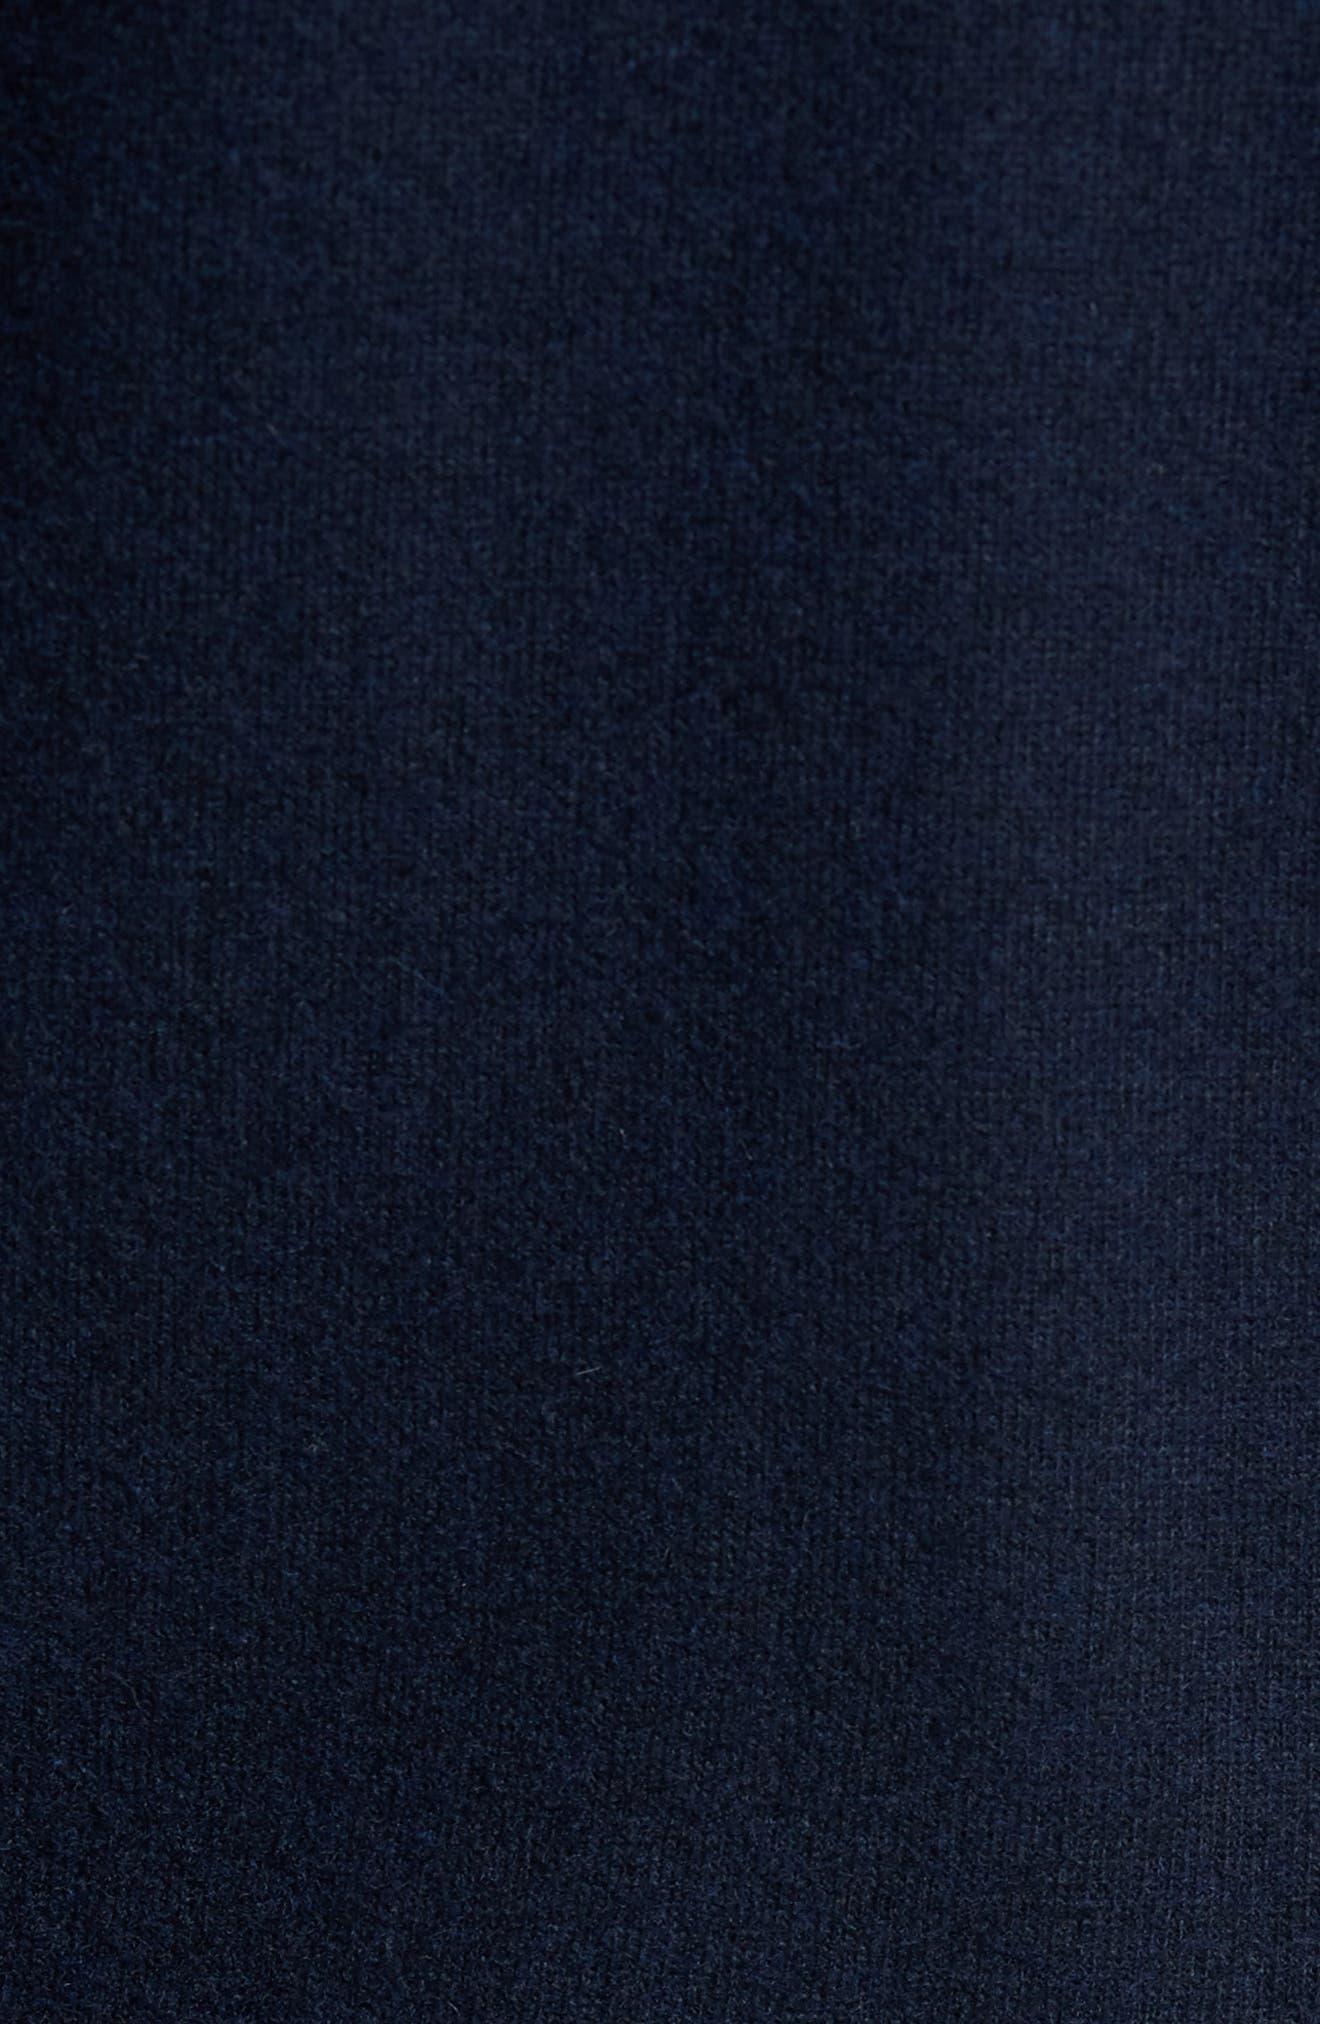 Wool Blend Hooded Cardigan,                             Alternate thumbnail 12, color,